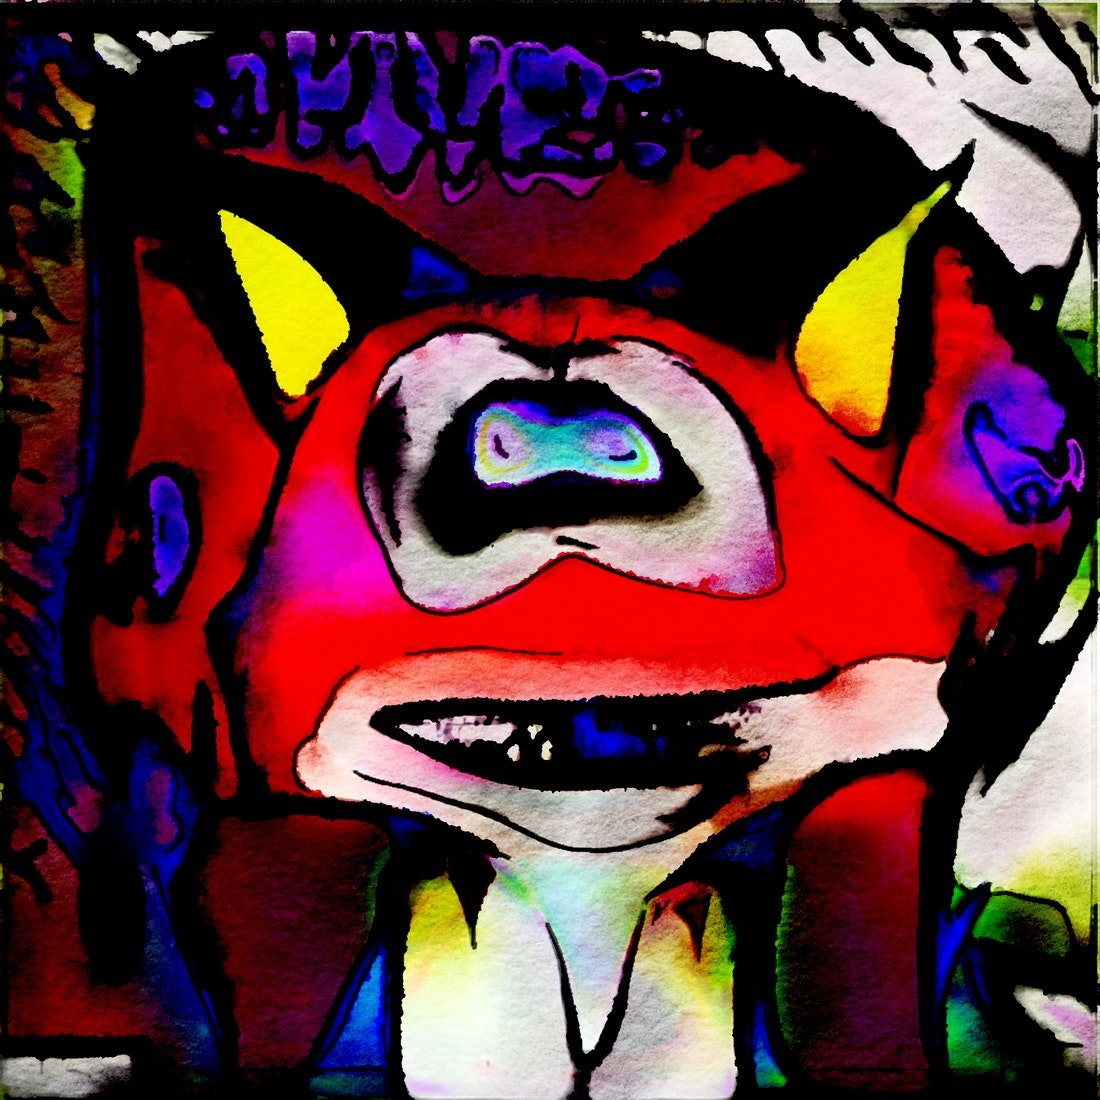 From The Bunny Project in November @KnownOrigin_io       #digitalart #rare #LimitedEdition #blockchain #photoshop #photograph #photo #experimental #abstract #surreal #absurd #cryptoart #eth #BTC #cartoon #generation #scary #funny